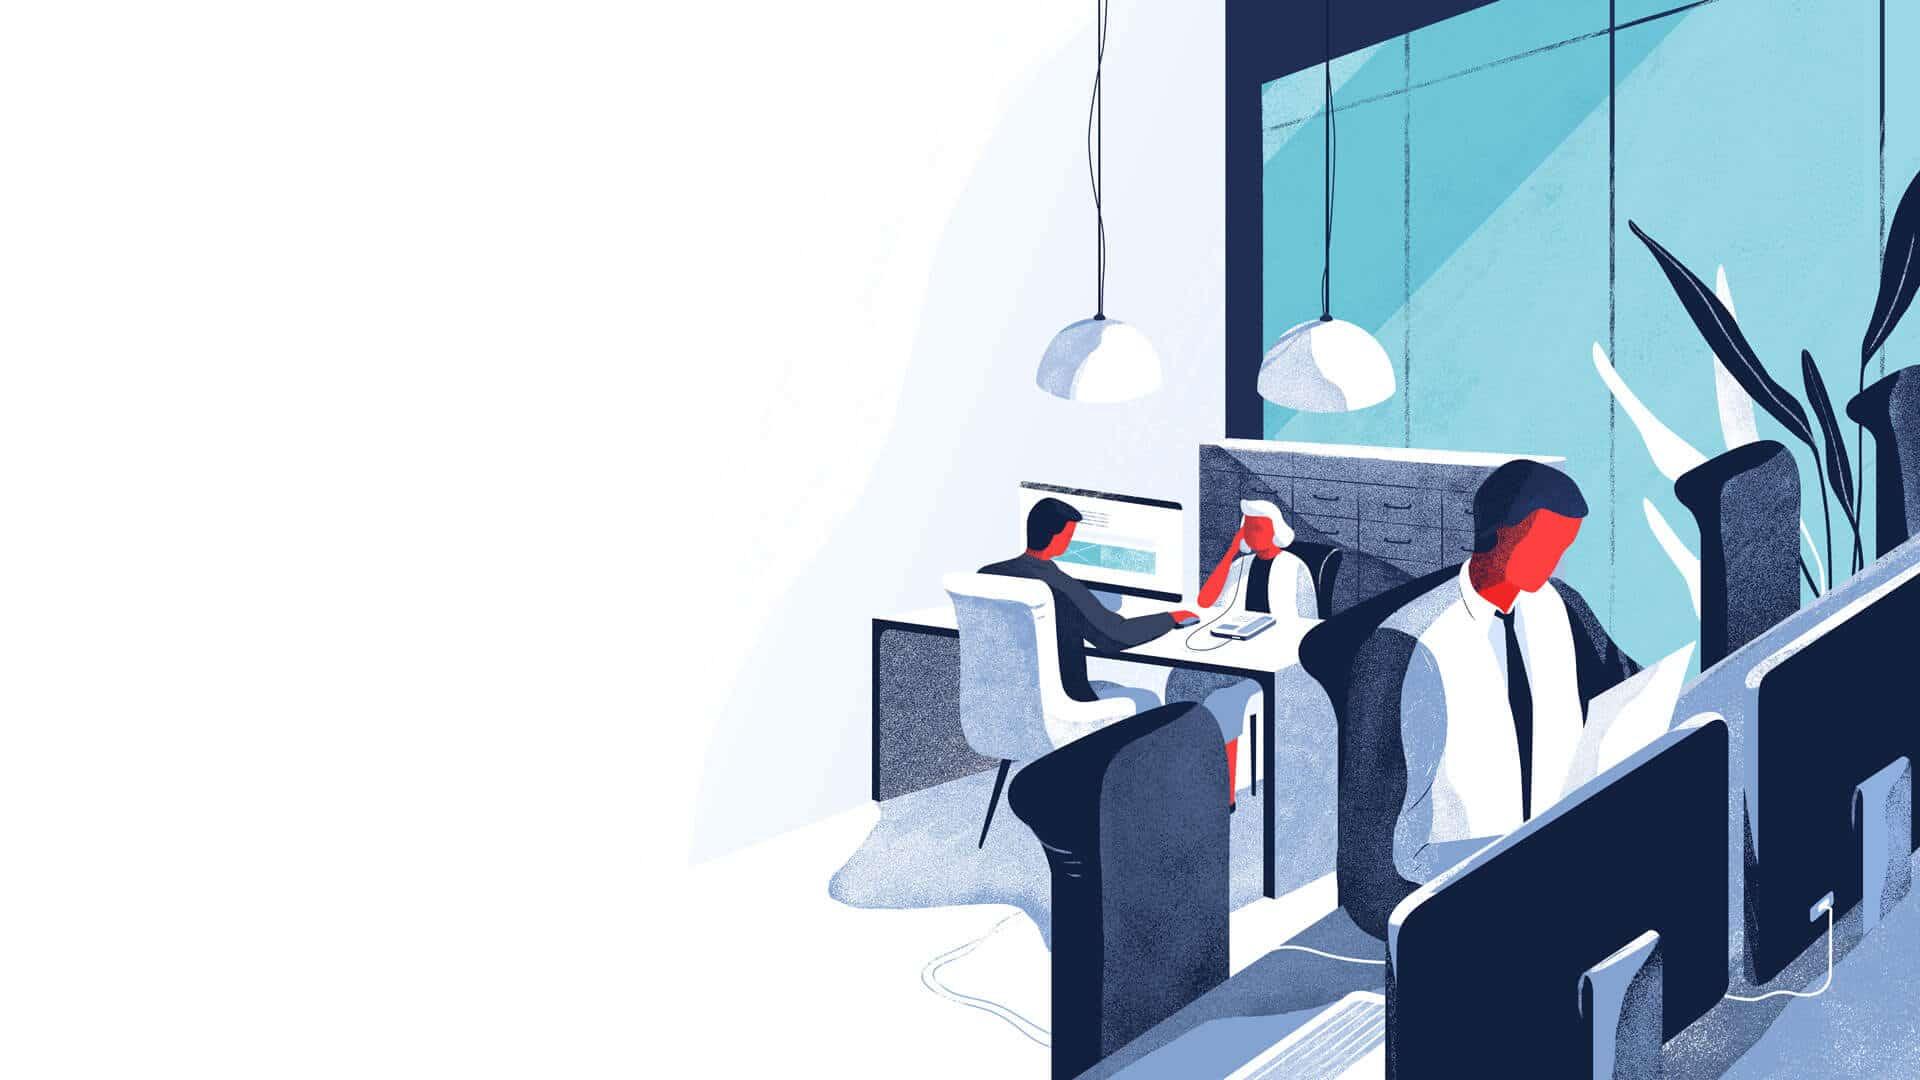 Workspaces evoluzione degli uffici arredati e coworking